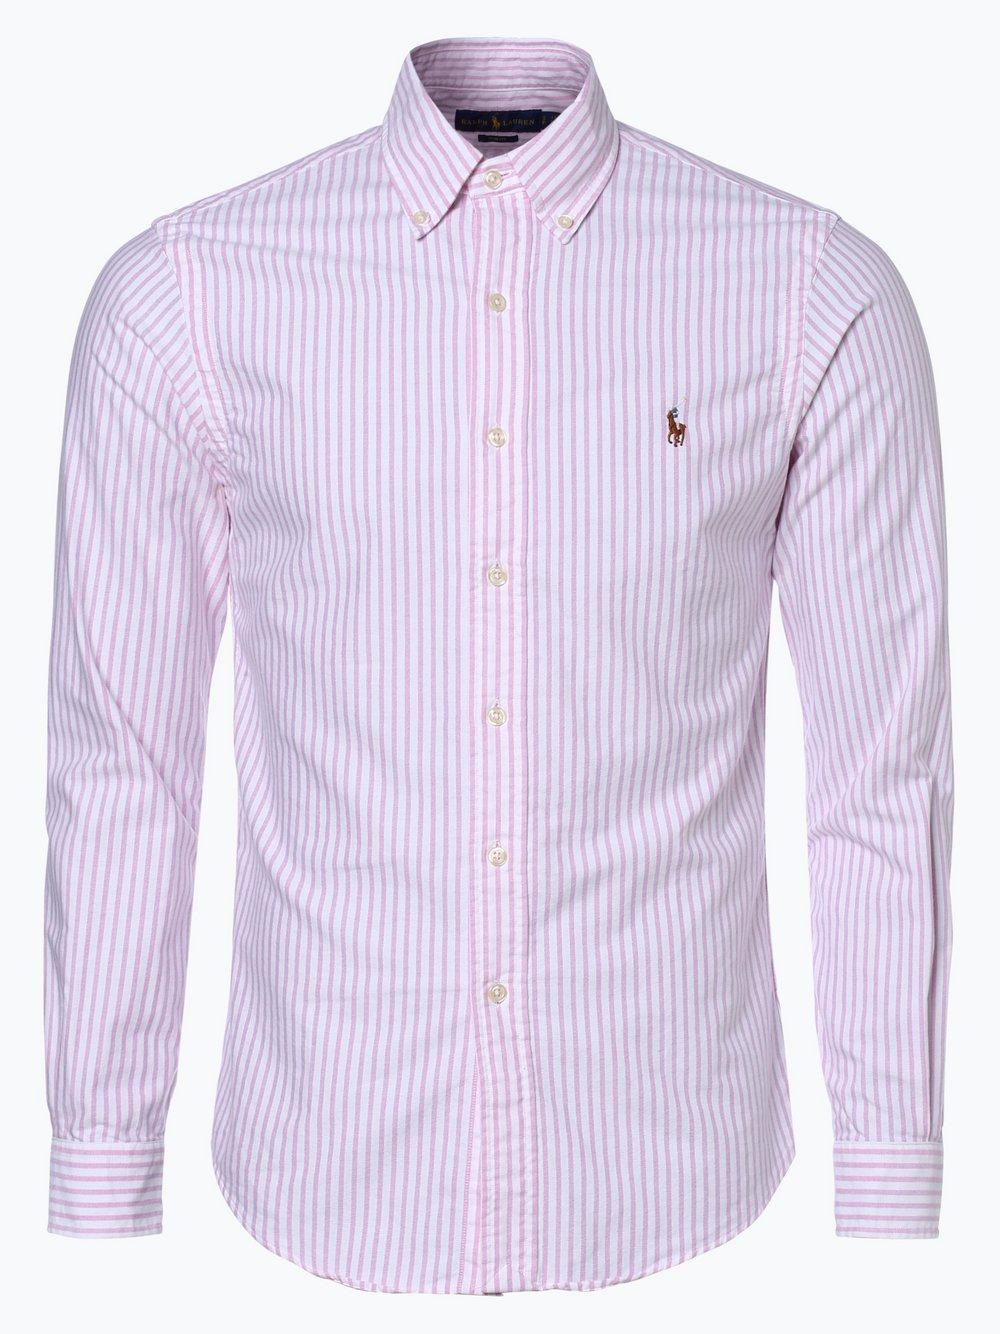 c7a07adc46ebaf Polo Ralph Lauren Herren Hemd Slim Fit rosa gestreift online kaufen ...